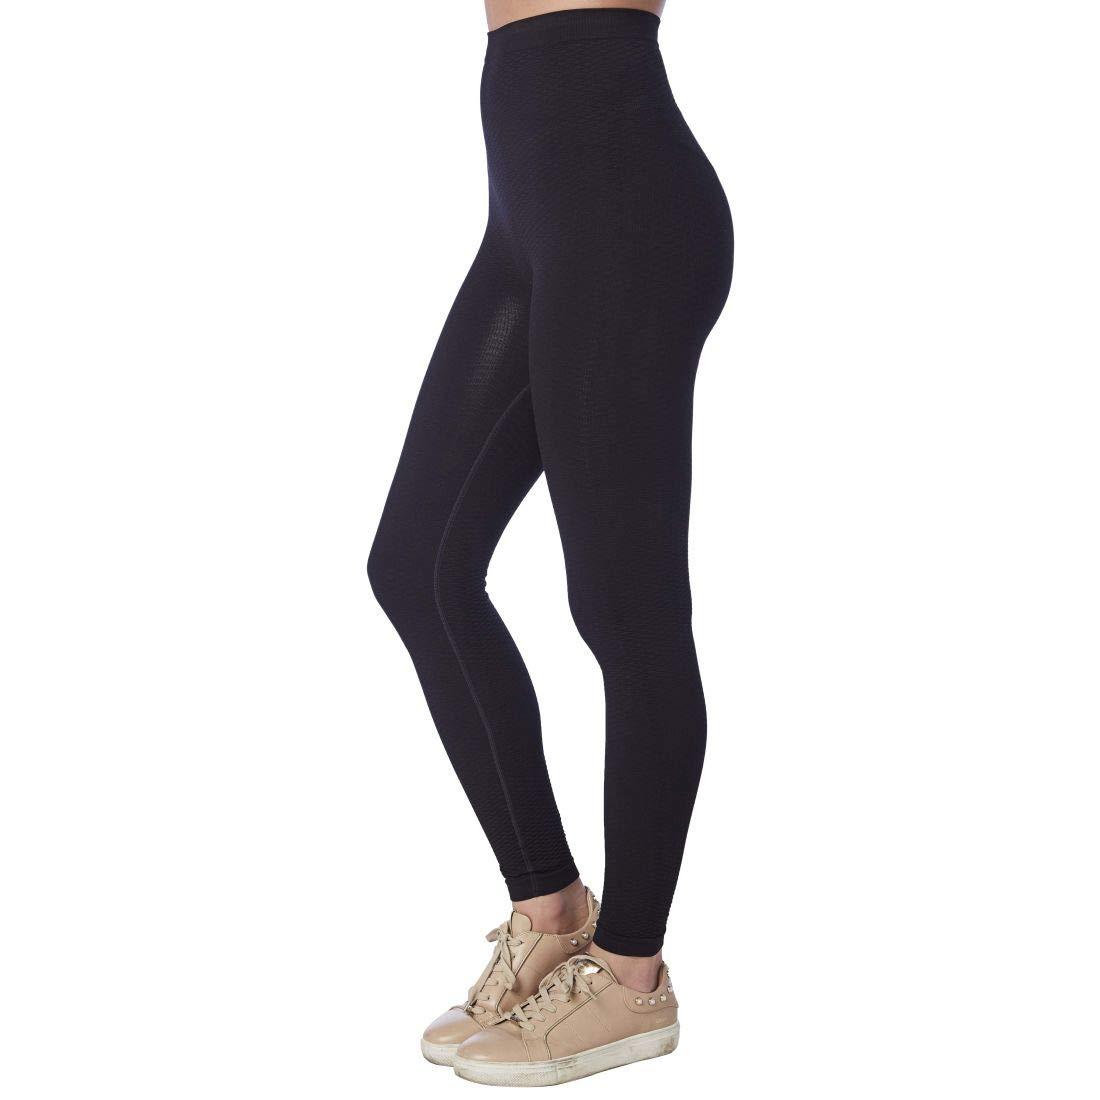 CzSalus Summer time Lipedema, Lymphedema Support Slimming Lighter Weight Medium Compression Leggings (XXL, Black) by CzSalus